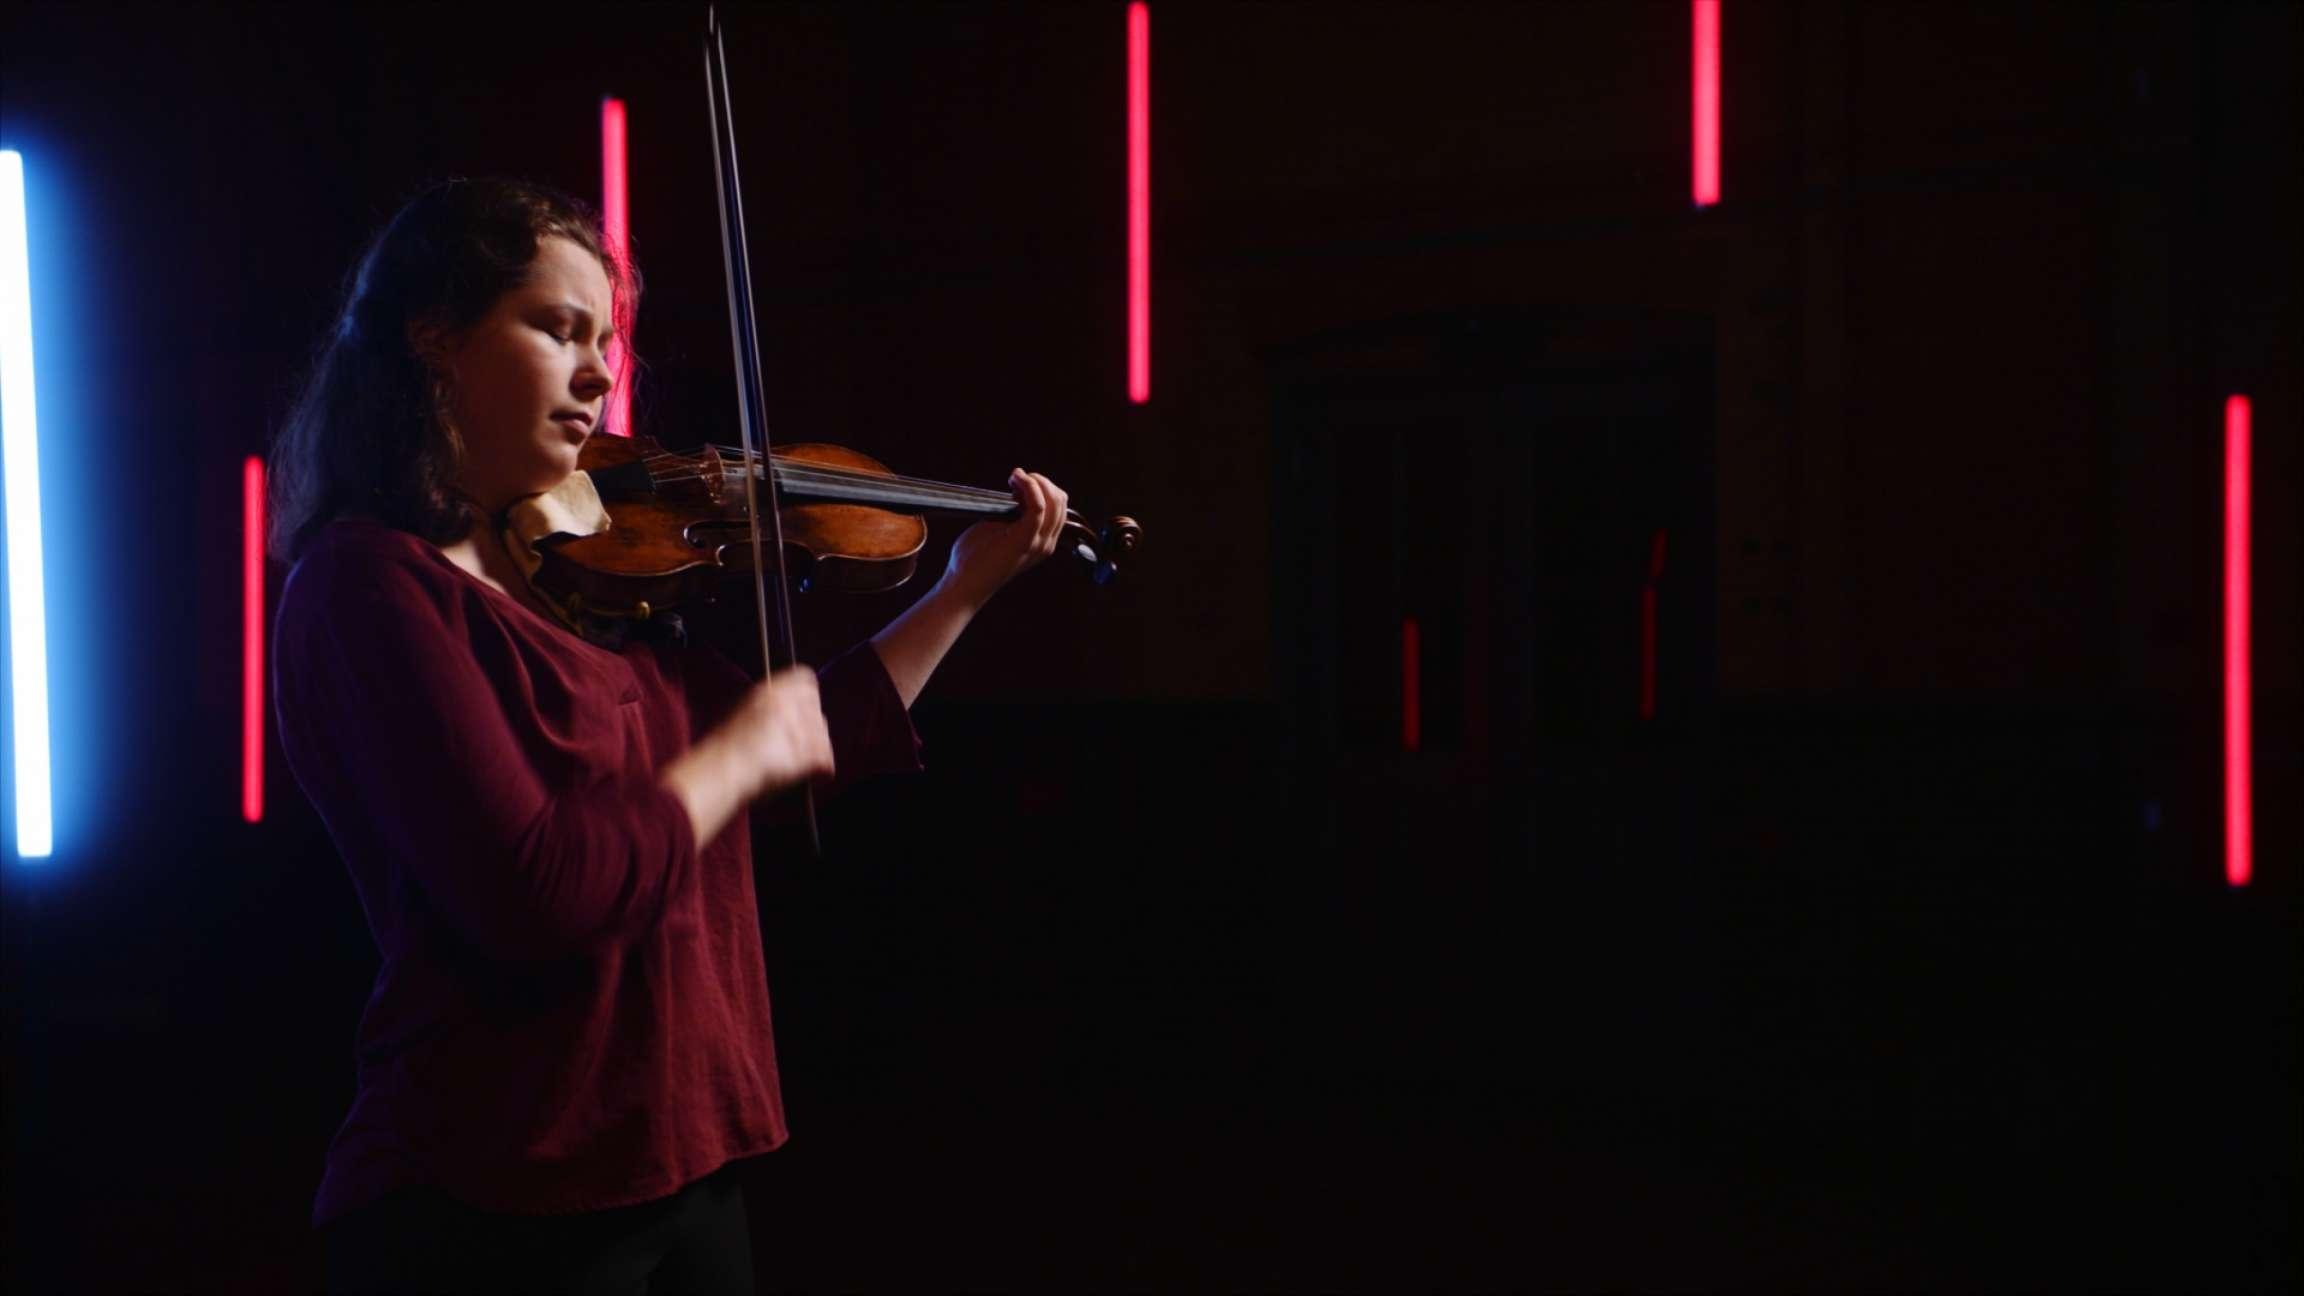 Fugue from Violin Sonata no. 1 in G minor